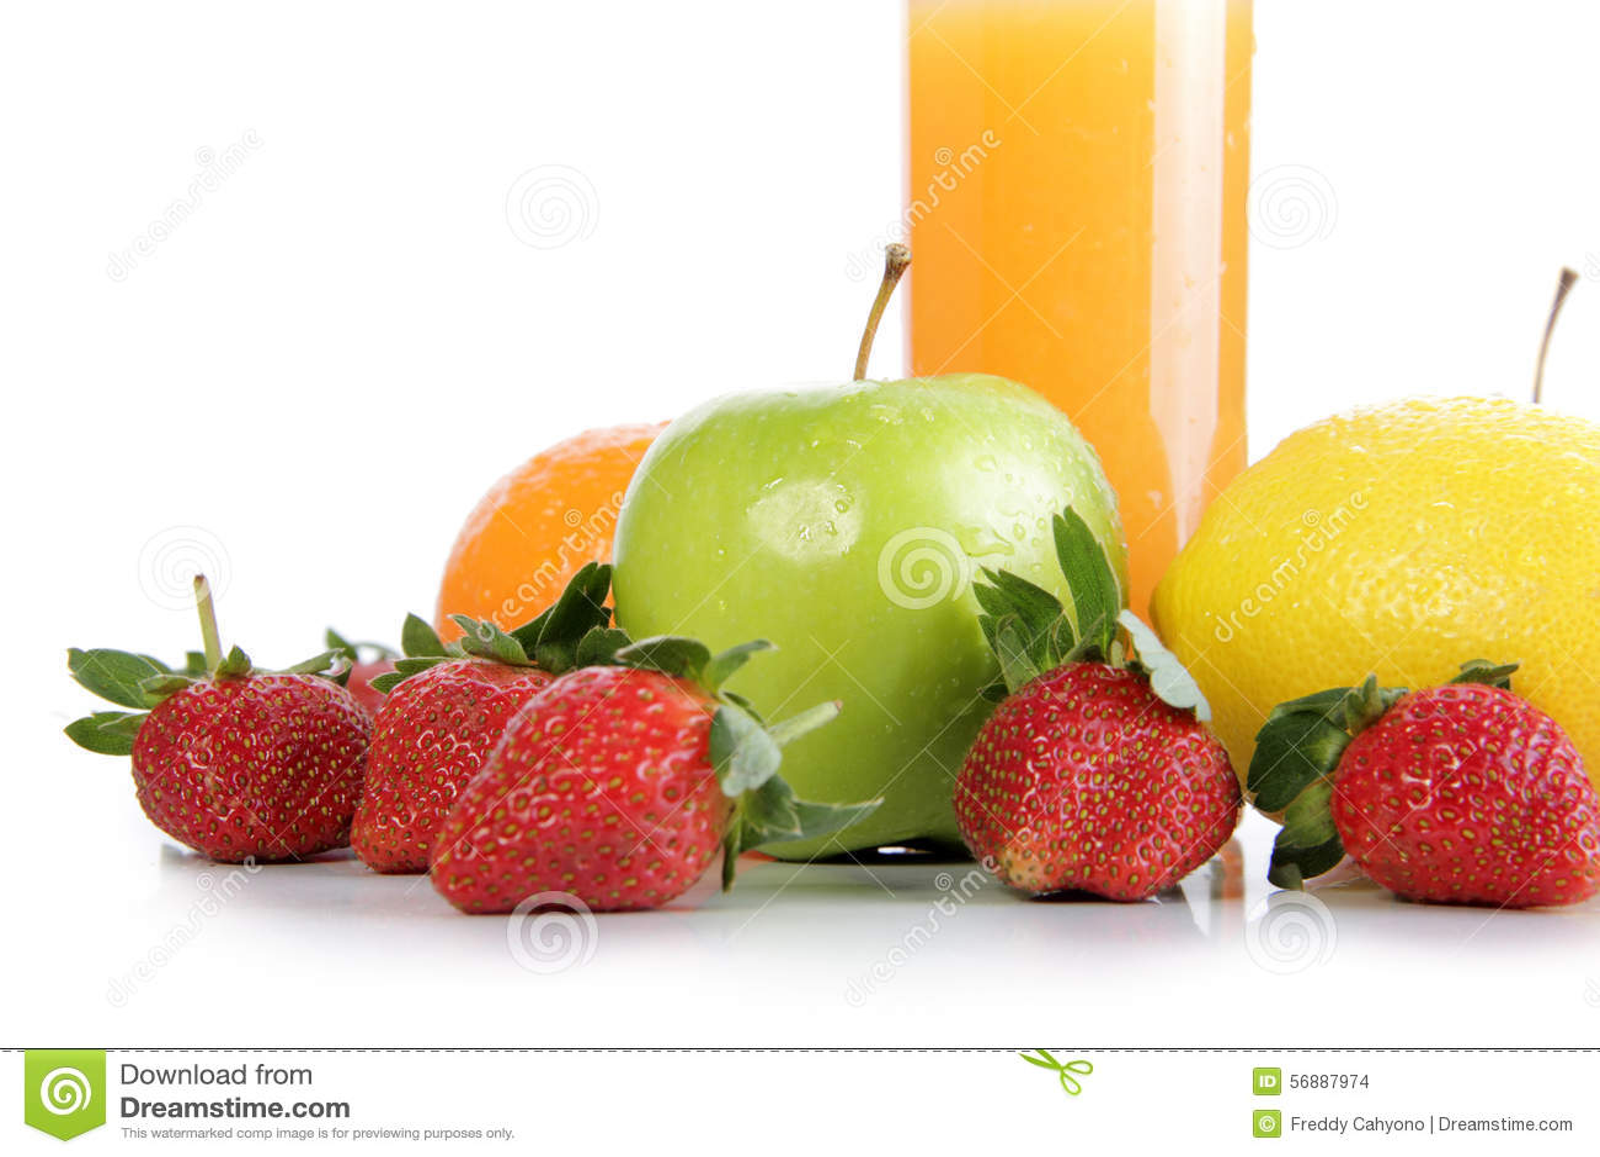 Frutta fresca e succo d arancia